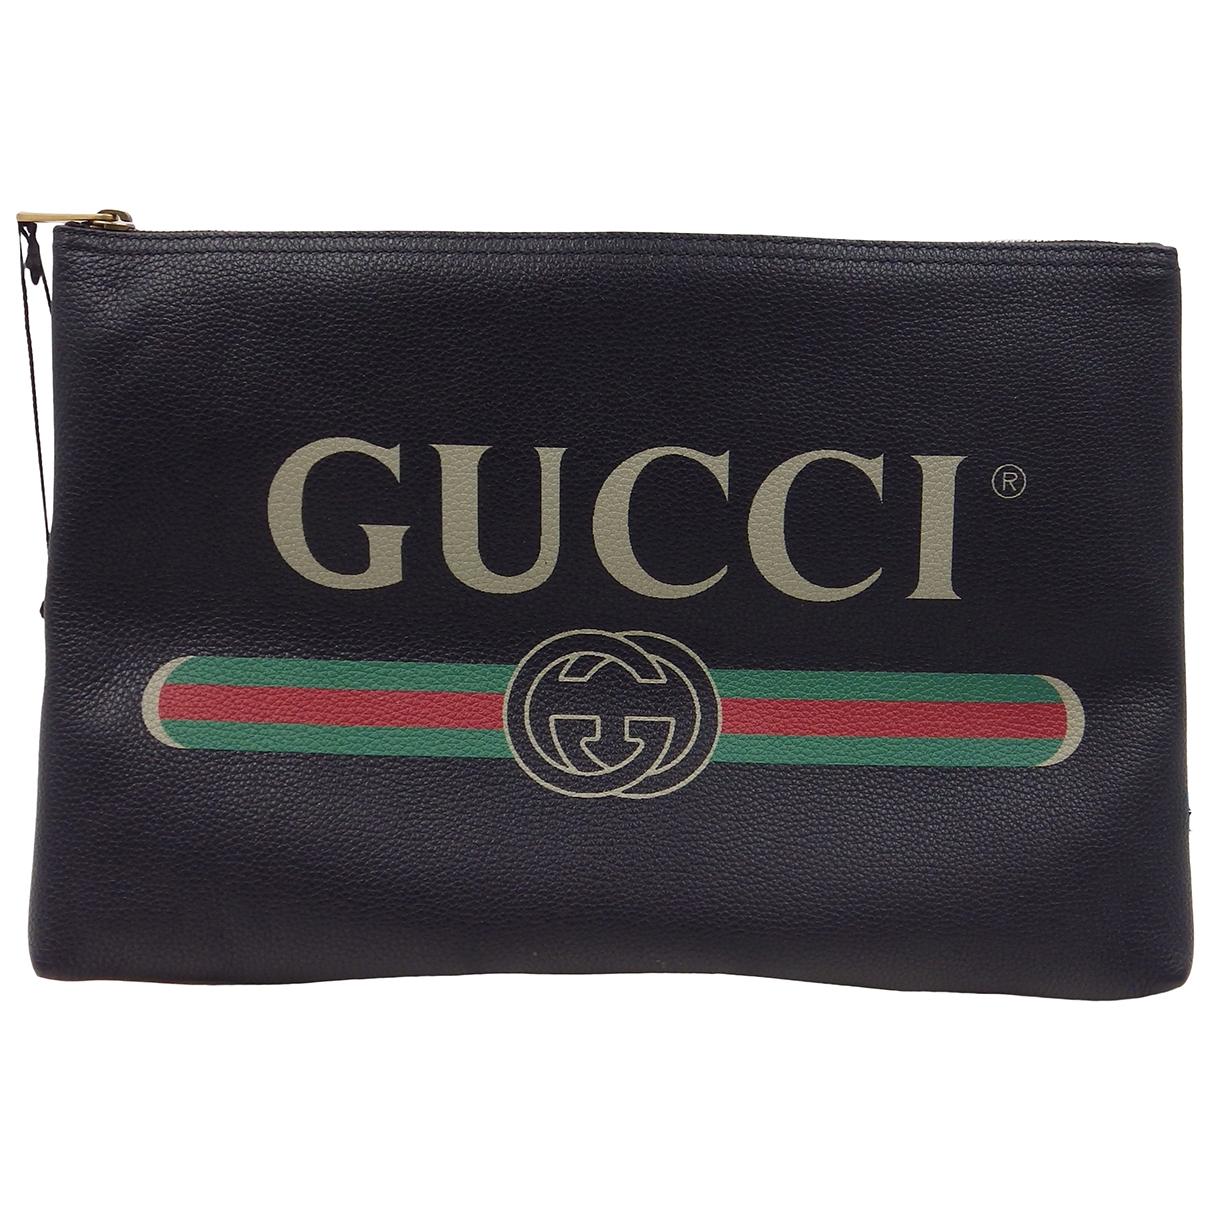 Gucci \N Black Leather Clutch bag for Women \N